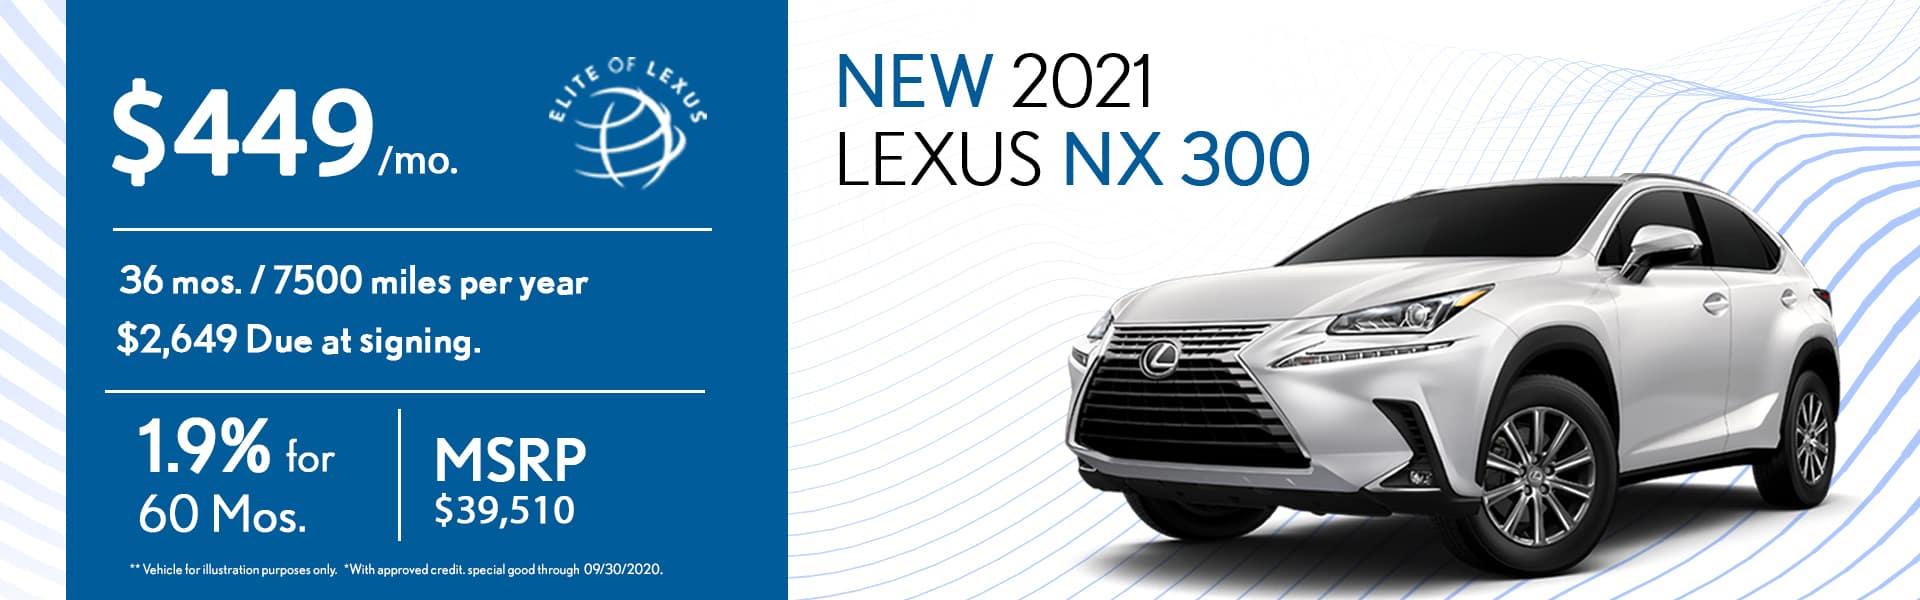 2020 Lexus NX 300 special